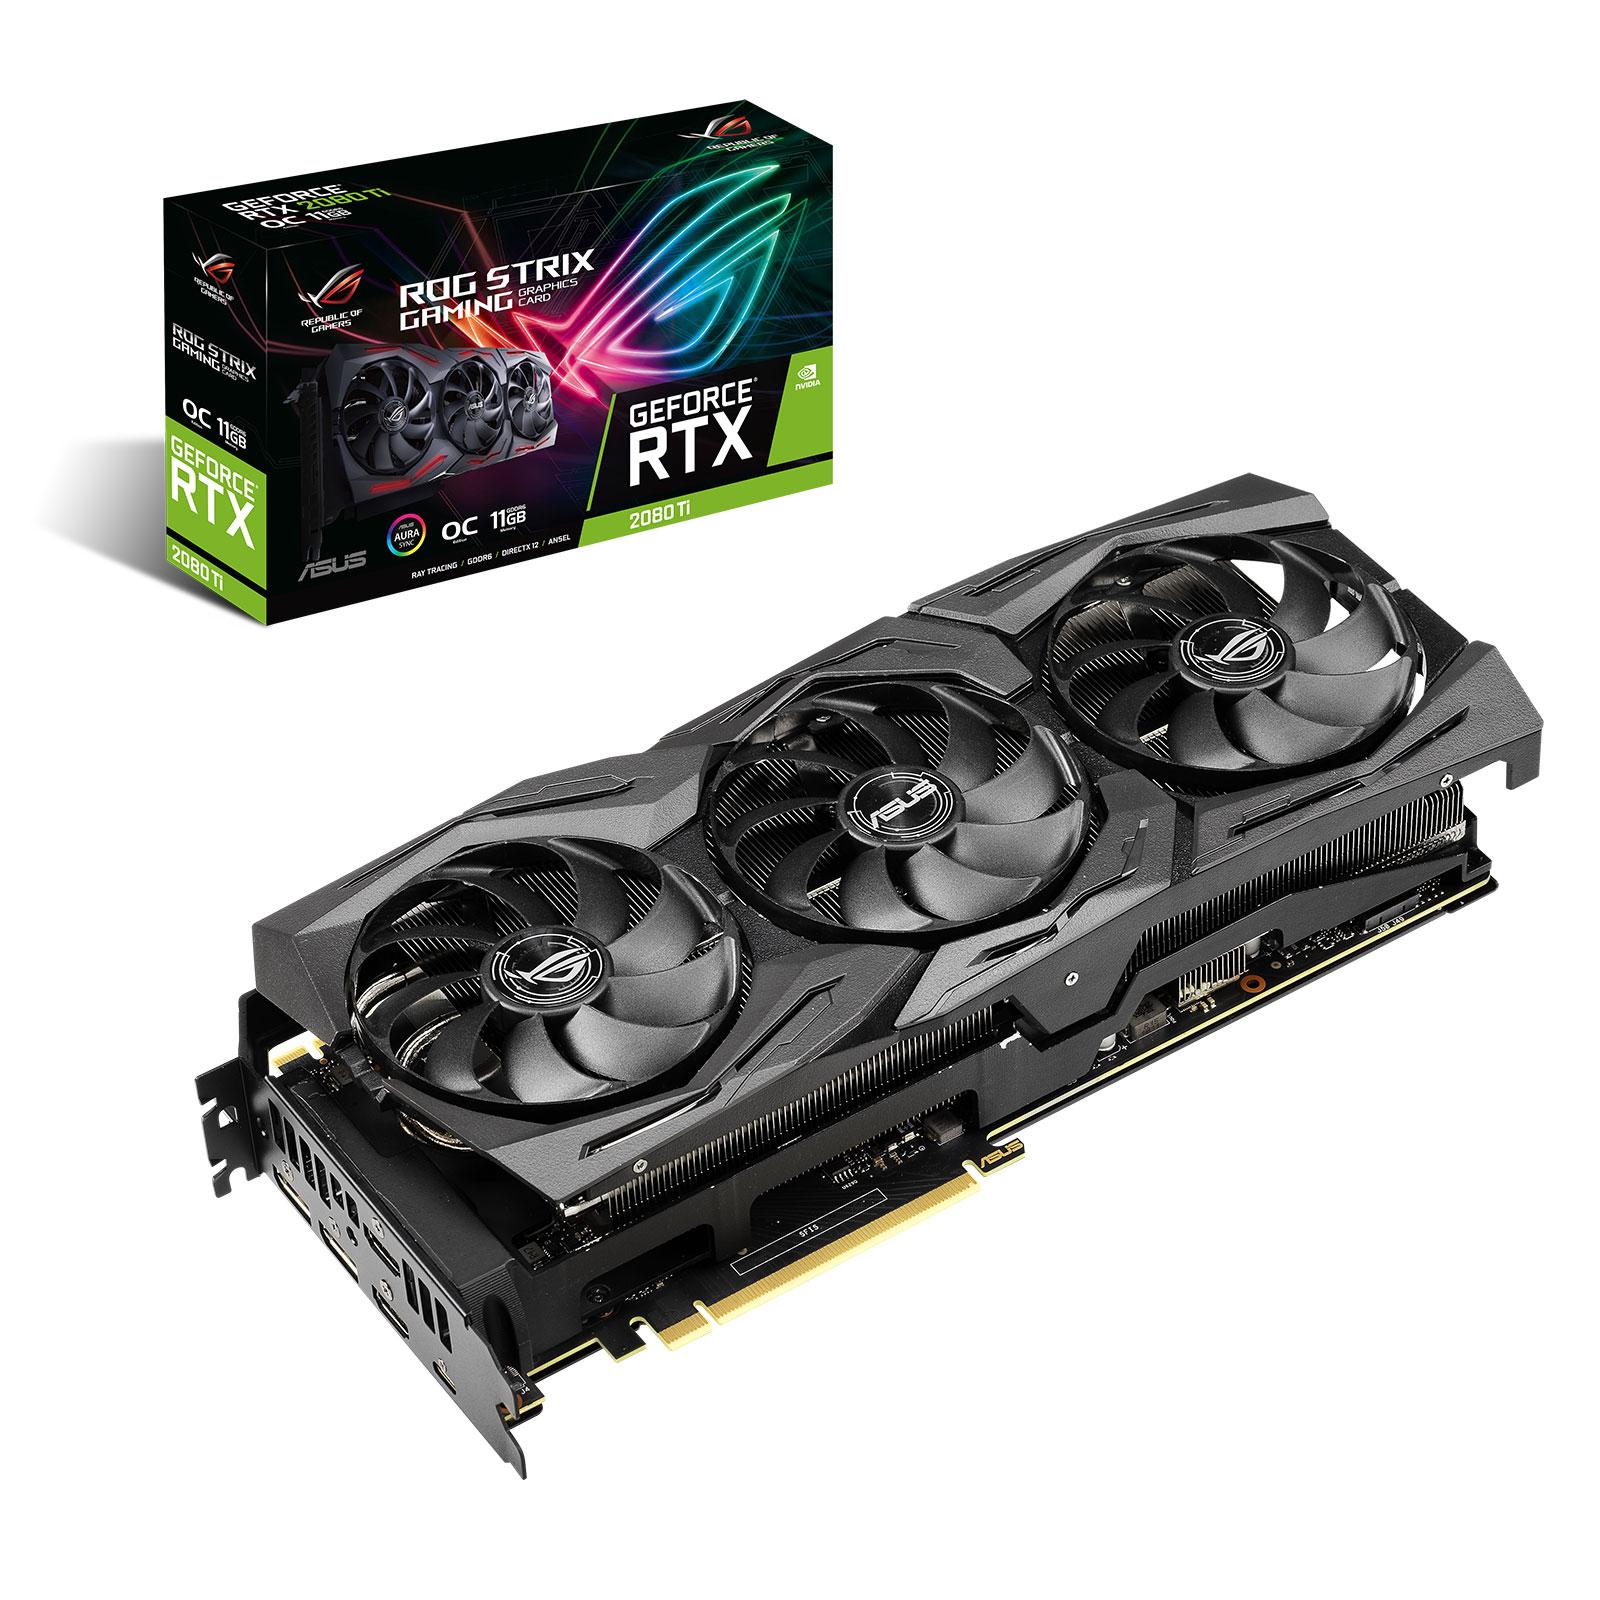 Carte graphique ASUS GeForce RTX 2080 Ti ROG-STRIX-RTX2080TI-A11G-GAMING 11 Go GDDR6 - HDMI/DisplayPort/USB Type-C - PCI Express (NVIDIA GeForce RTX 2080 Ti)